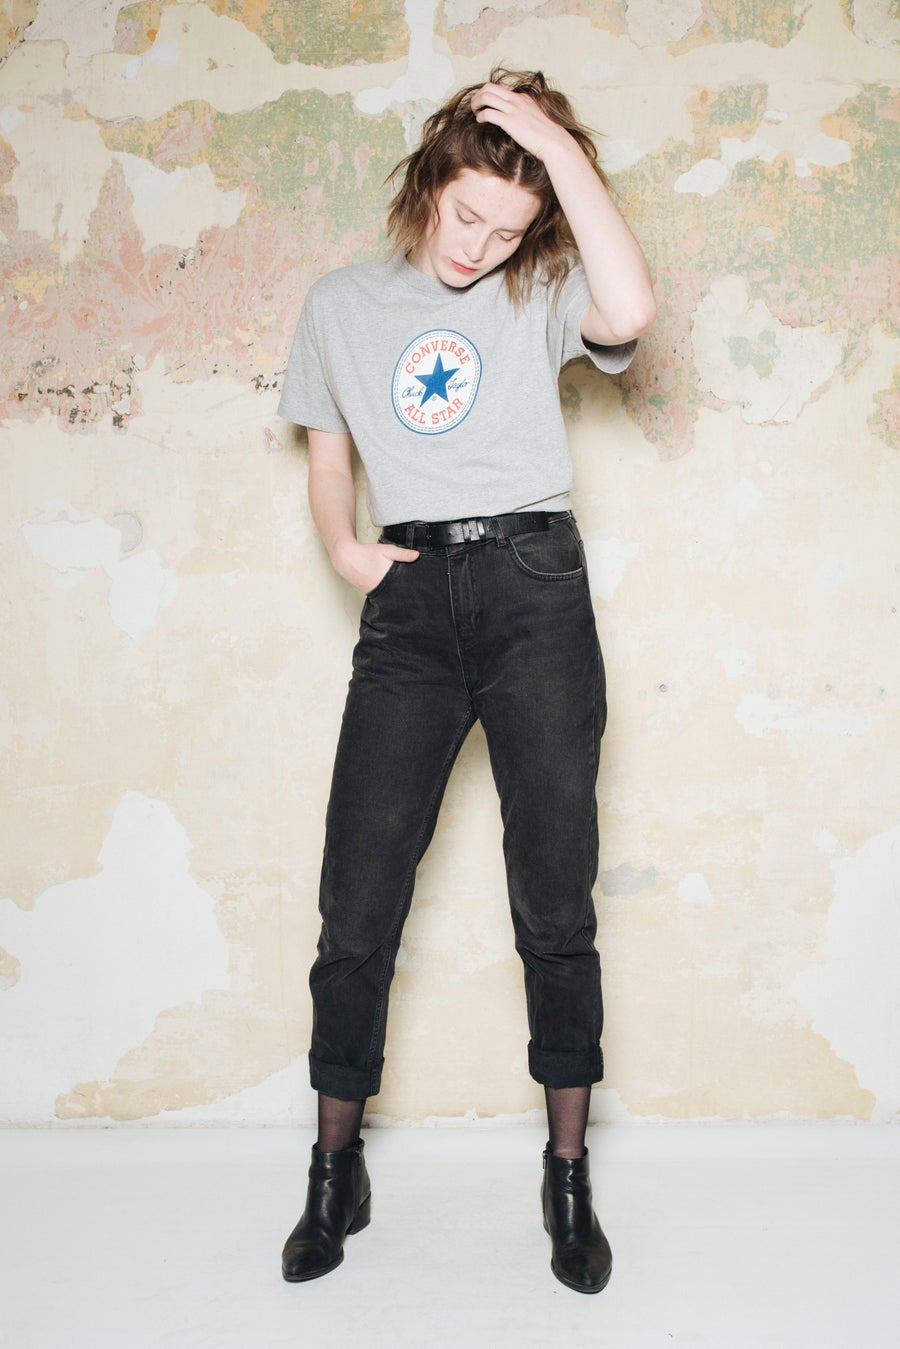 Image of Converse Allstars Tshirt